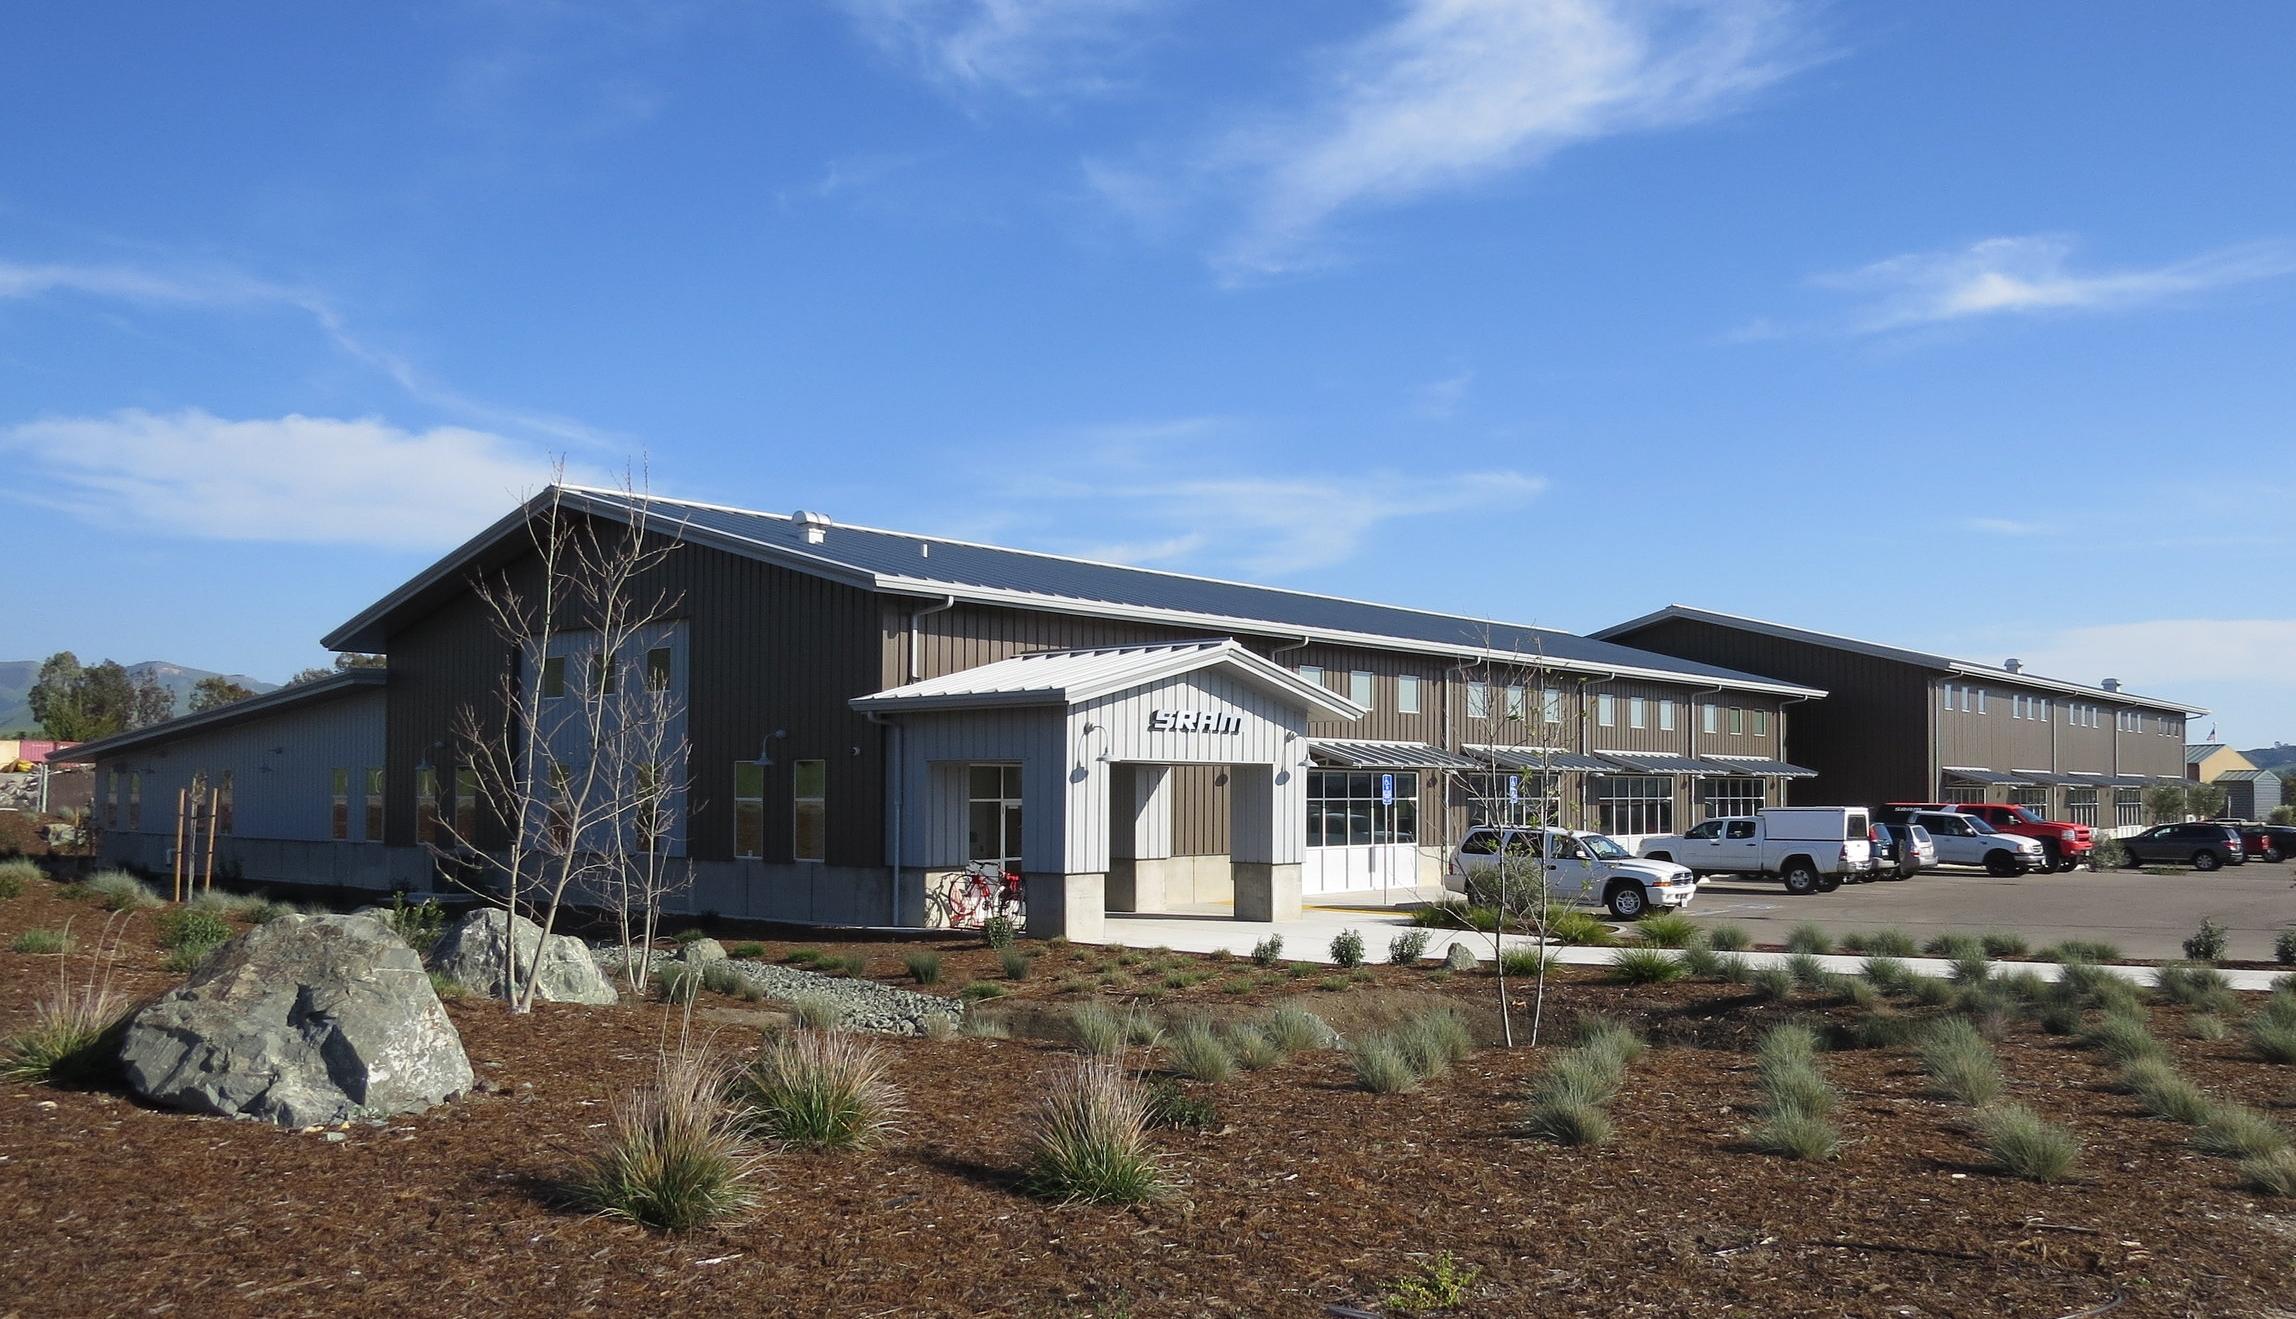 New Commercial Building in San Luis Obispo, CA.